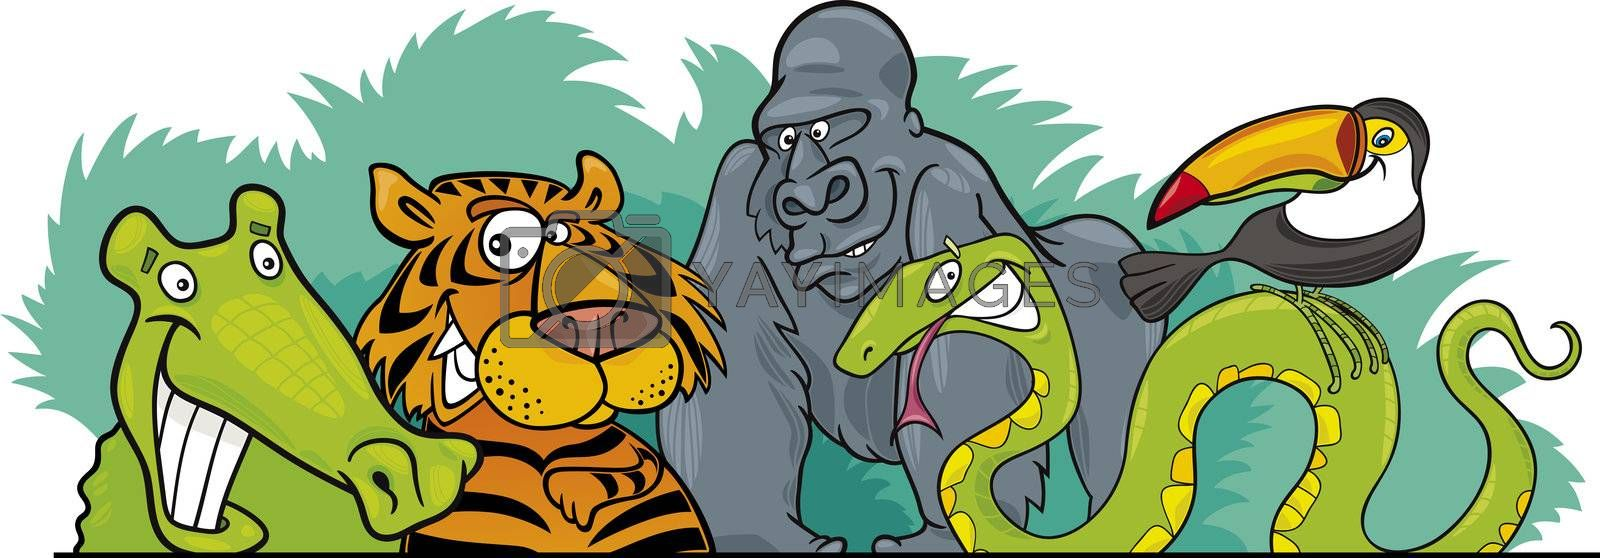 Cartoon illustration of Jungle Wild Animals header design